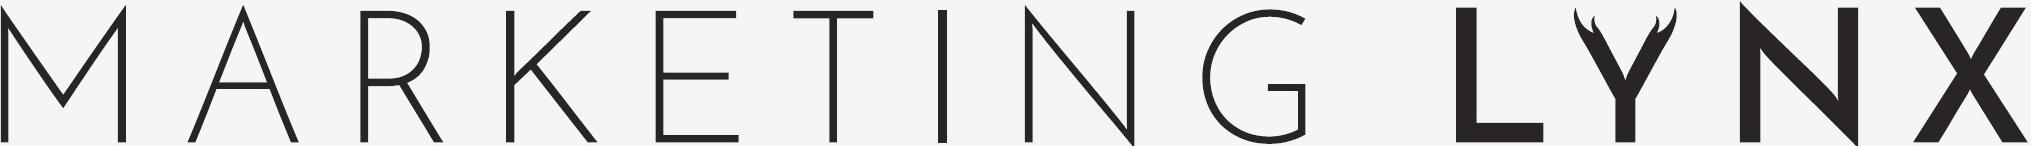 marketing-lynx-logo-website-2